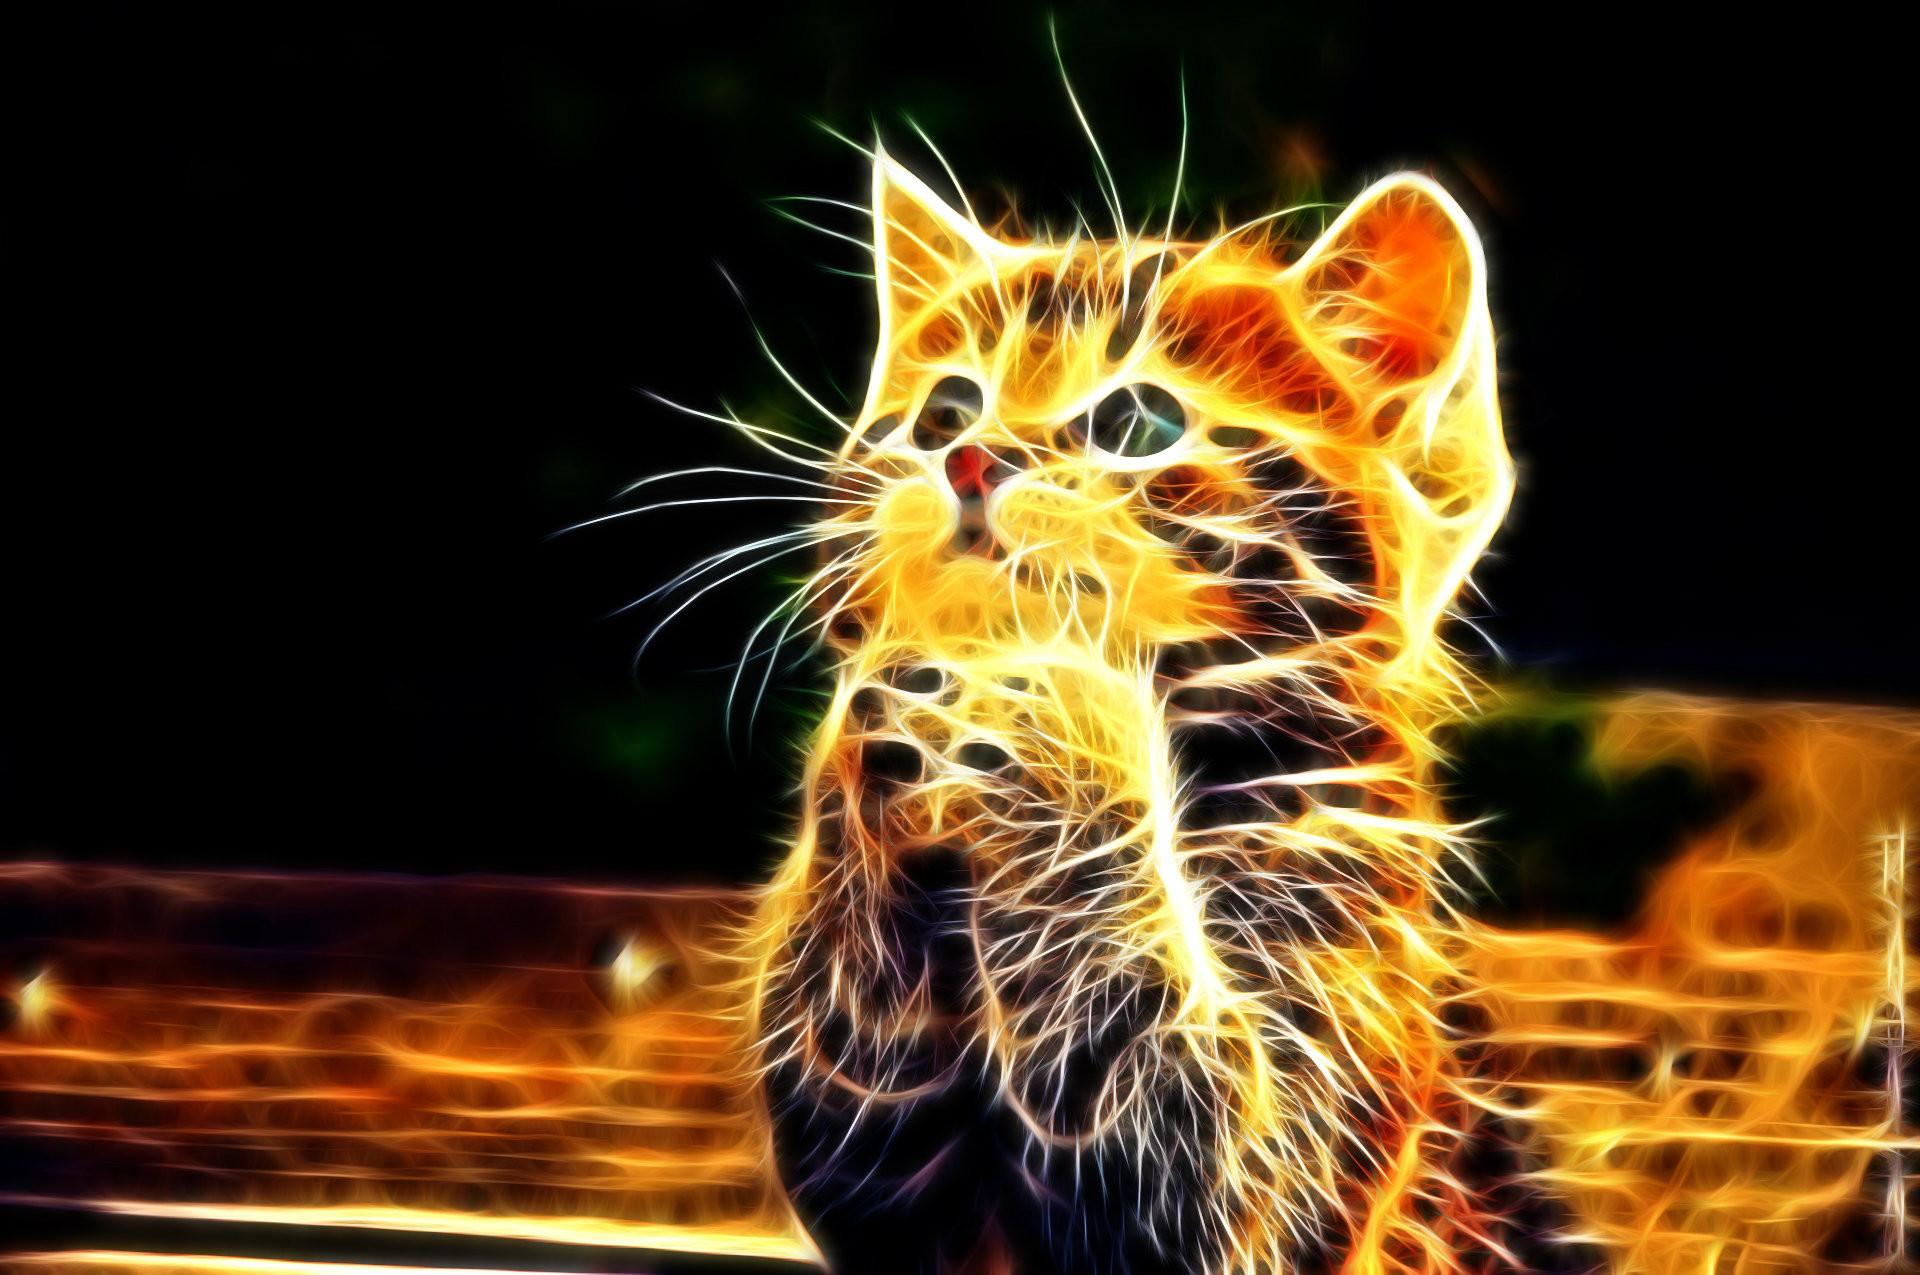 Cat Abstract HD Wallpaper